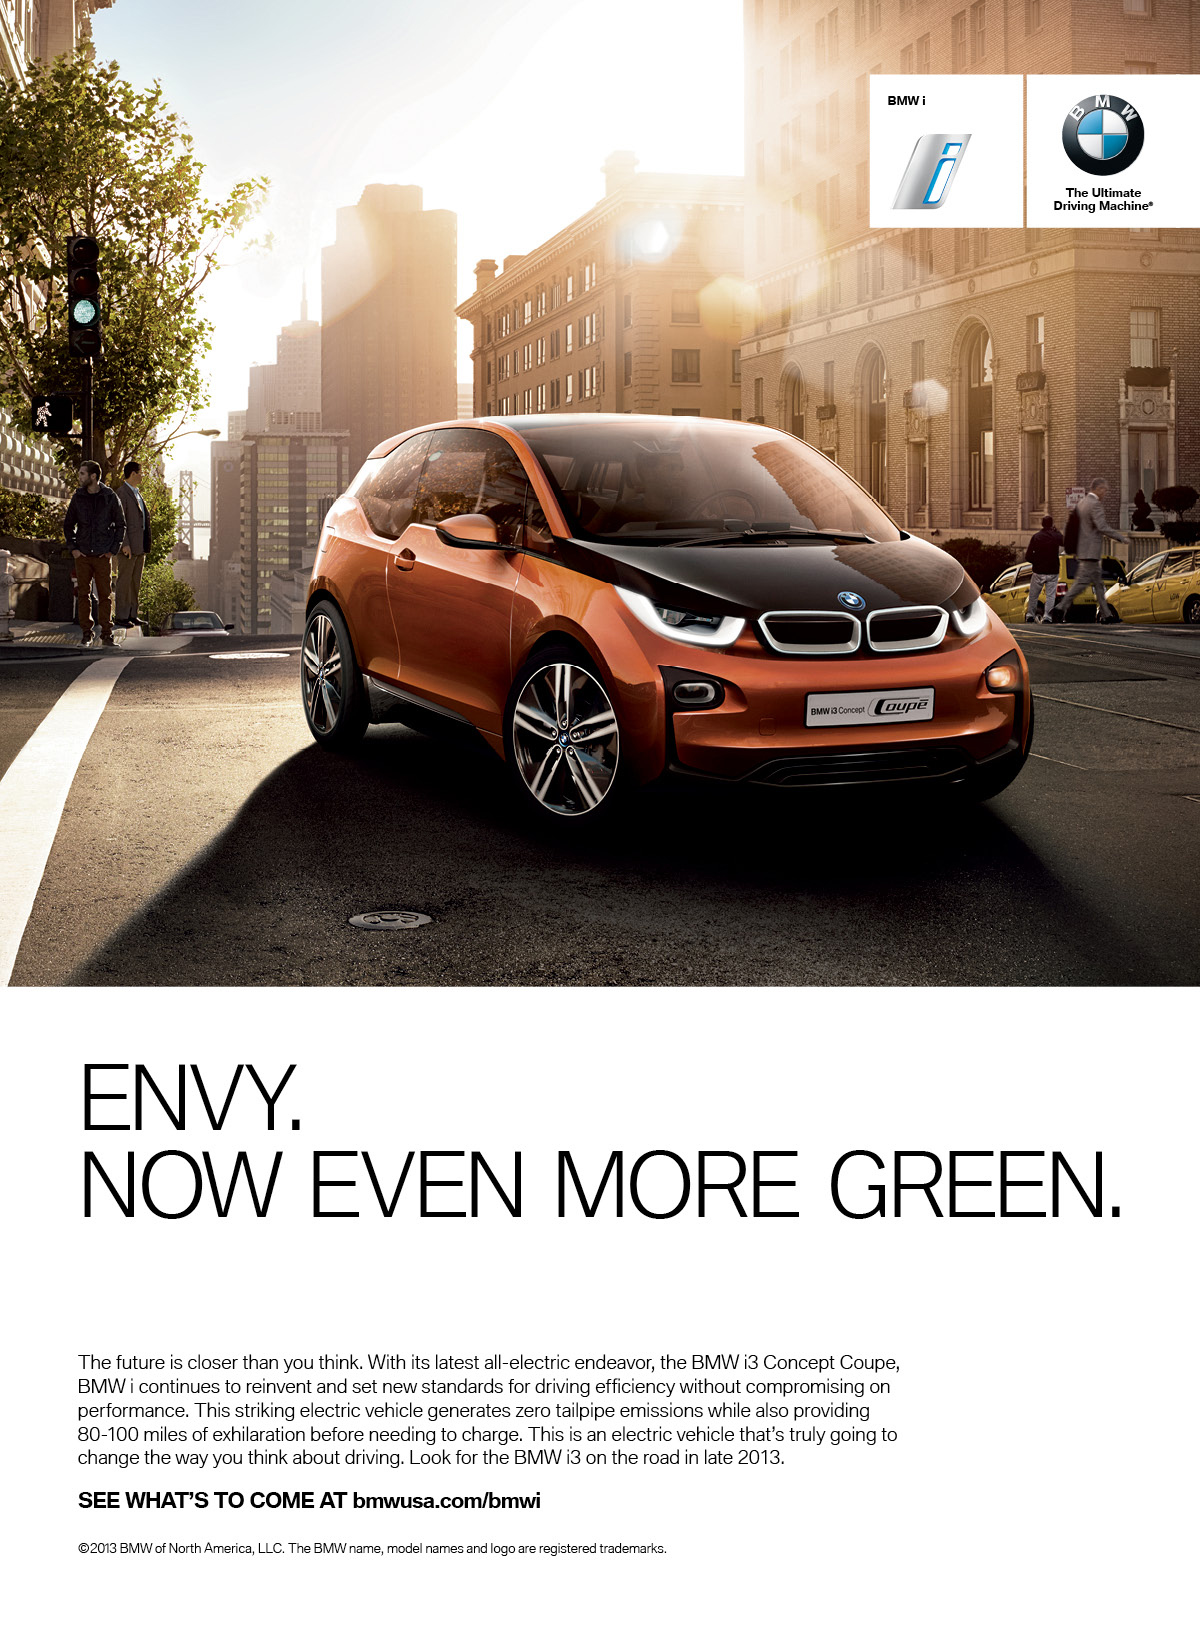 BMW-i-GQ-Print-Envy.jpg